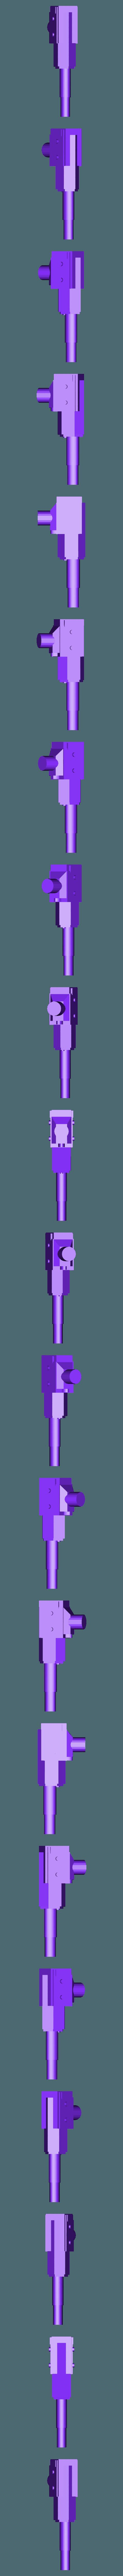 Shoulder_Cannon.stl Download free STL file Modular Linebacker Mech • 3D printing object, mrhers2